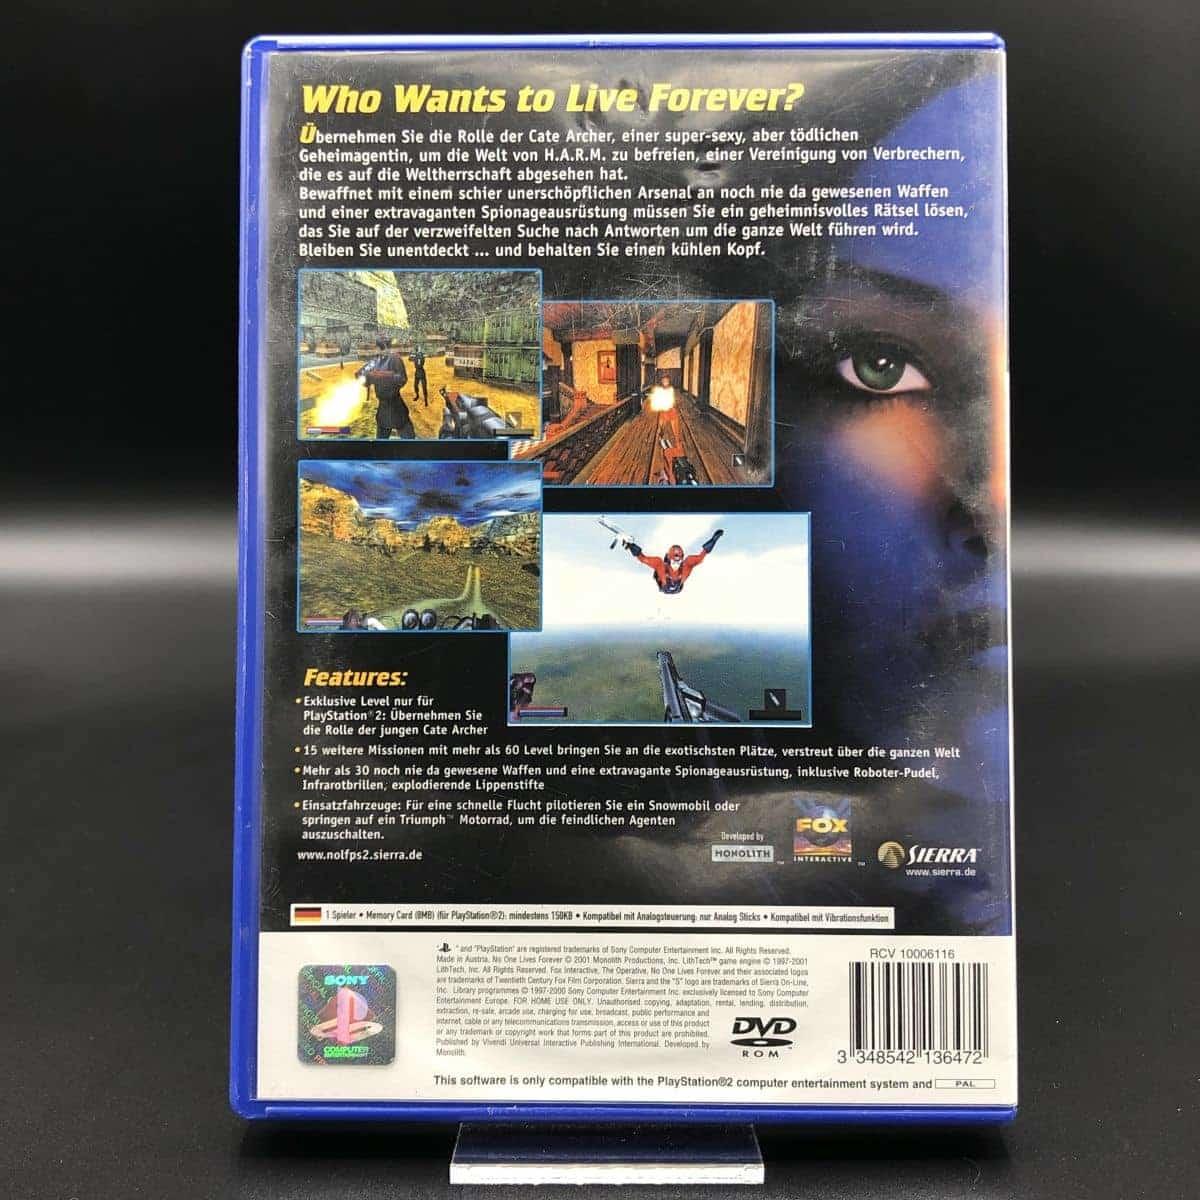 PS2 The Operative: No One Lives Forever (Komplett) (Gebrauchsspuren) Sony PlayStation 2